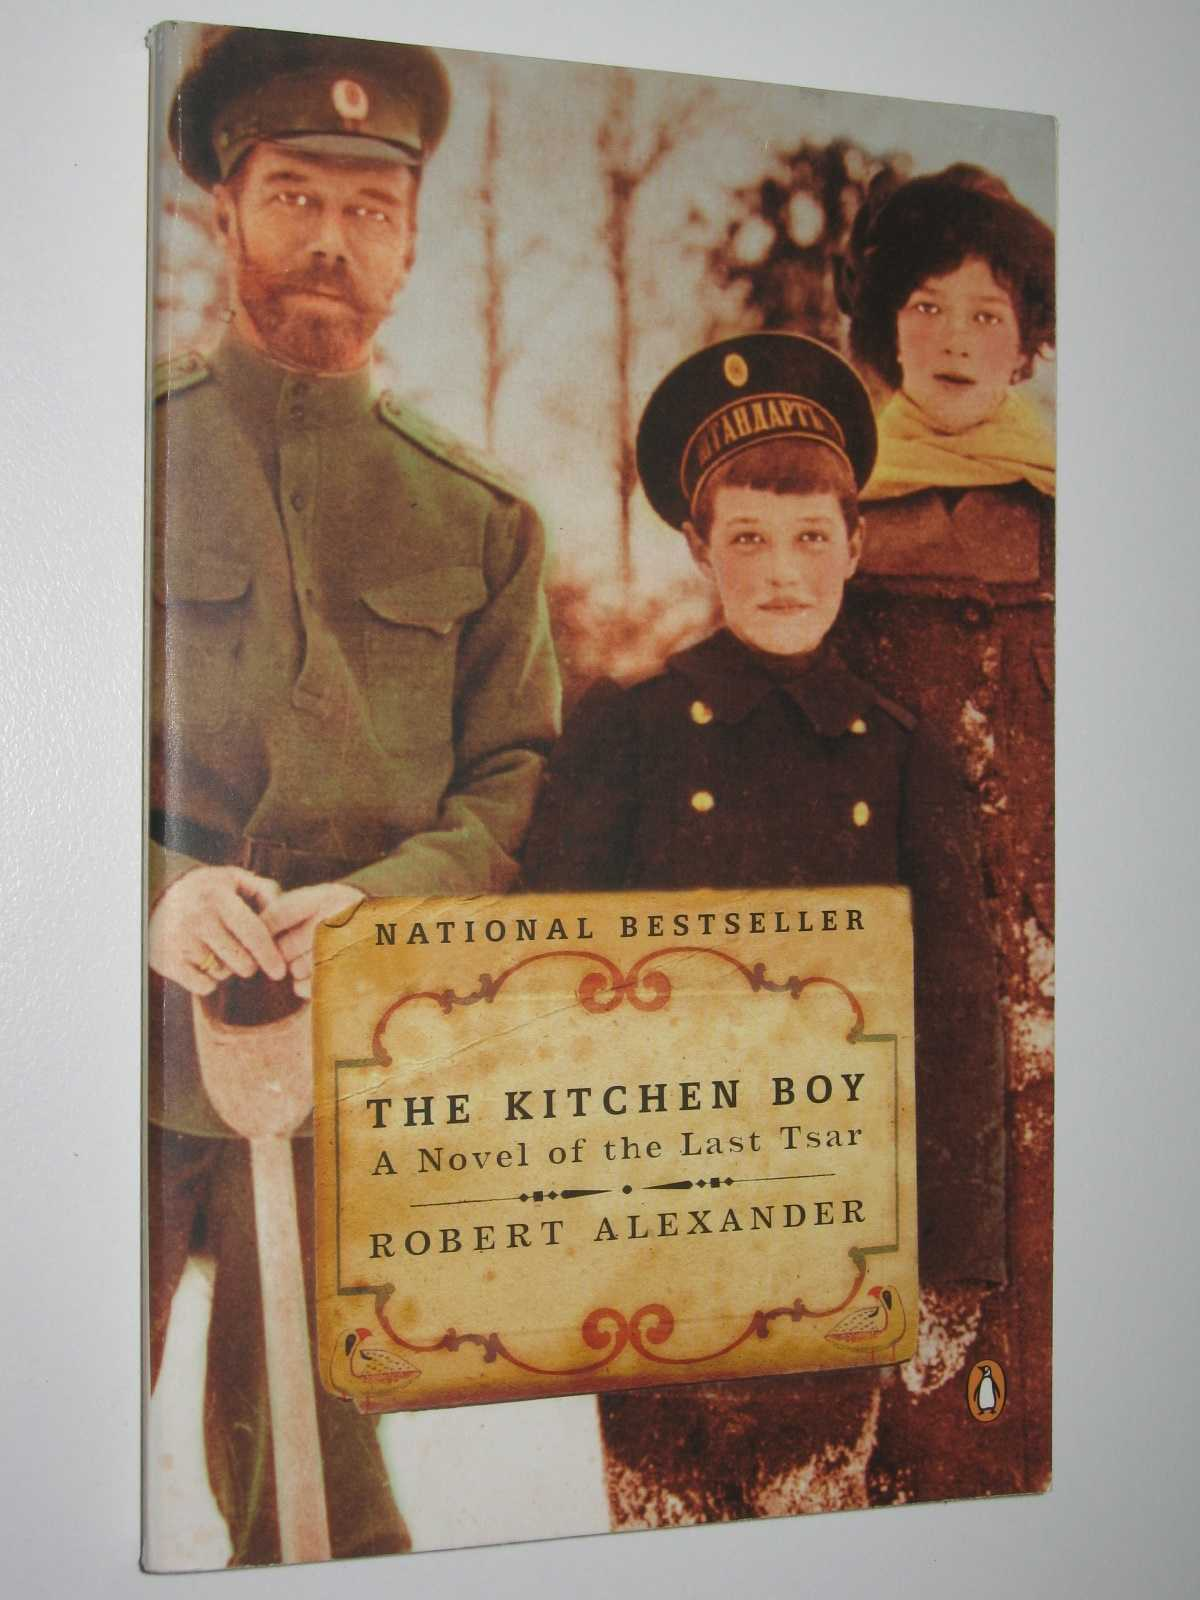 The Kitchen Boy : A Novel of the Last Tsar, Alexander, Robert